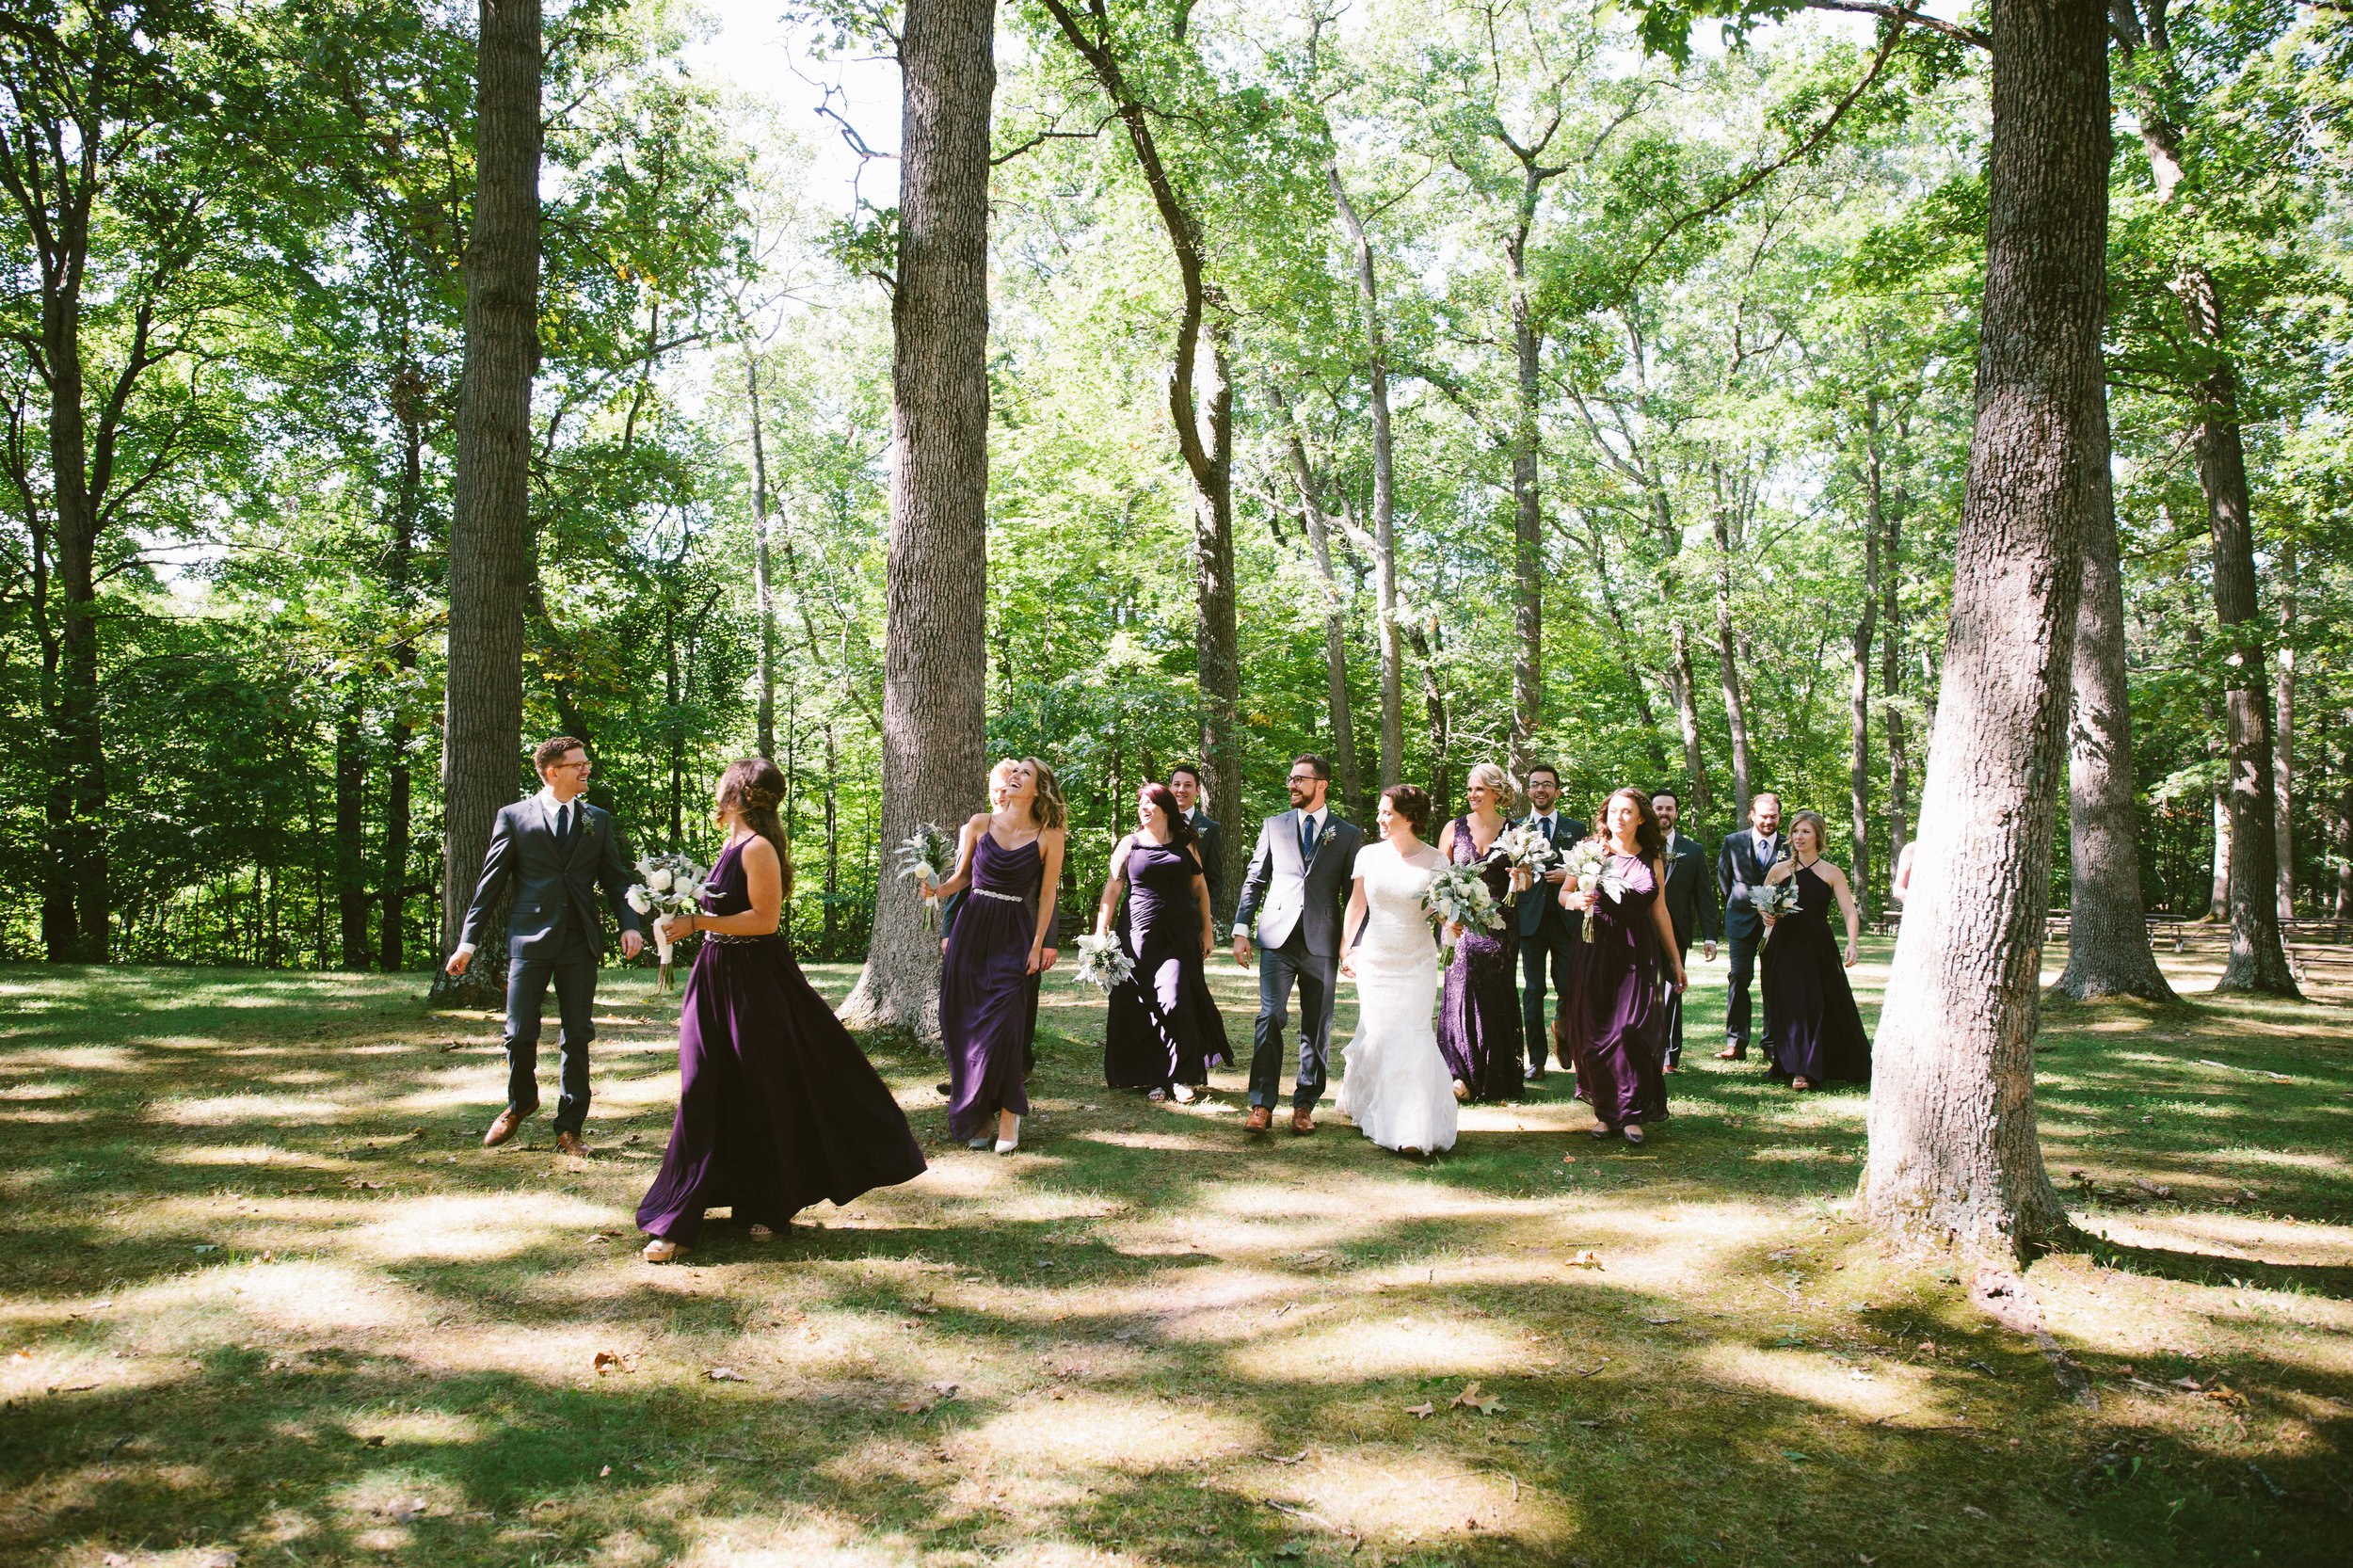 grand_rapids_wedding_rockford_wedding_richard_app_gallery_wedding_grand_rapids_wedding_photographer_summer_wedding_wabasis_lake_park_wedding_rustic_wedding-24.jpg